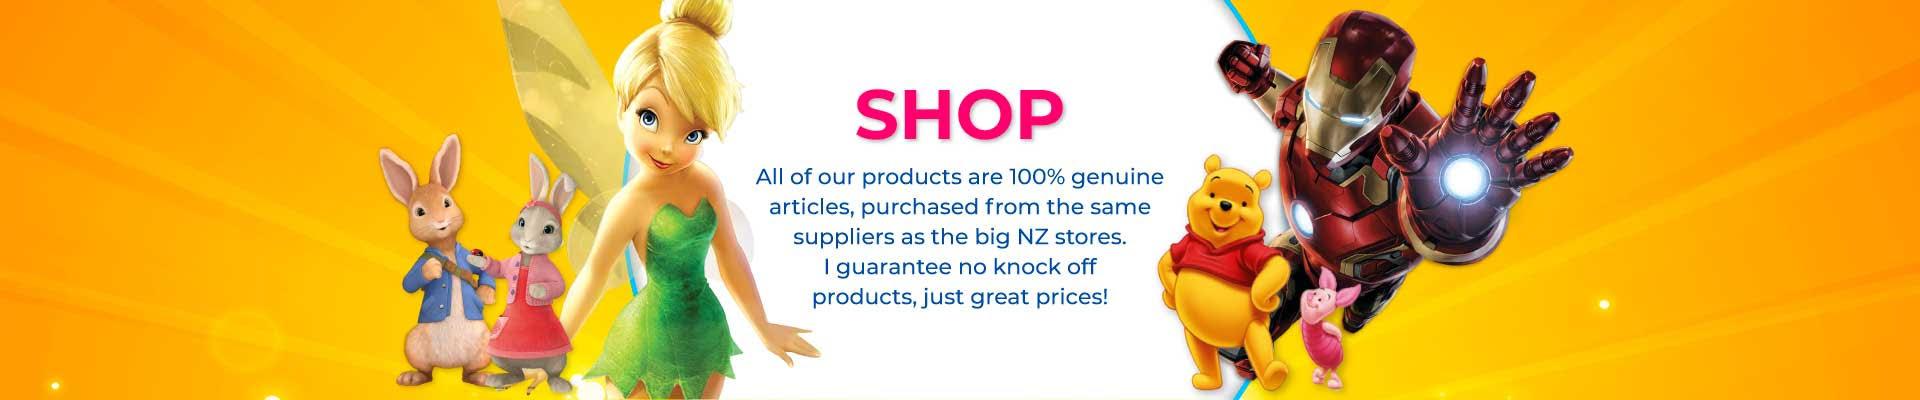 Thomas Online Shop Banner